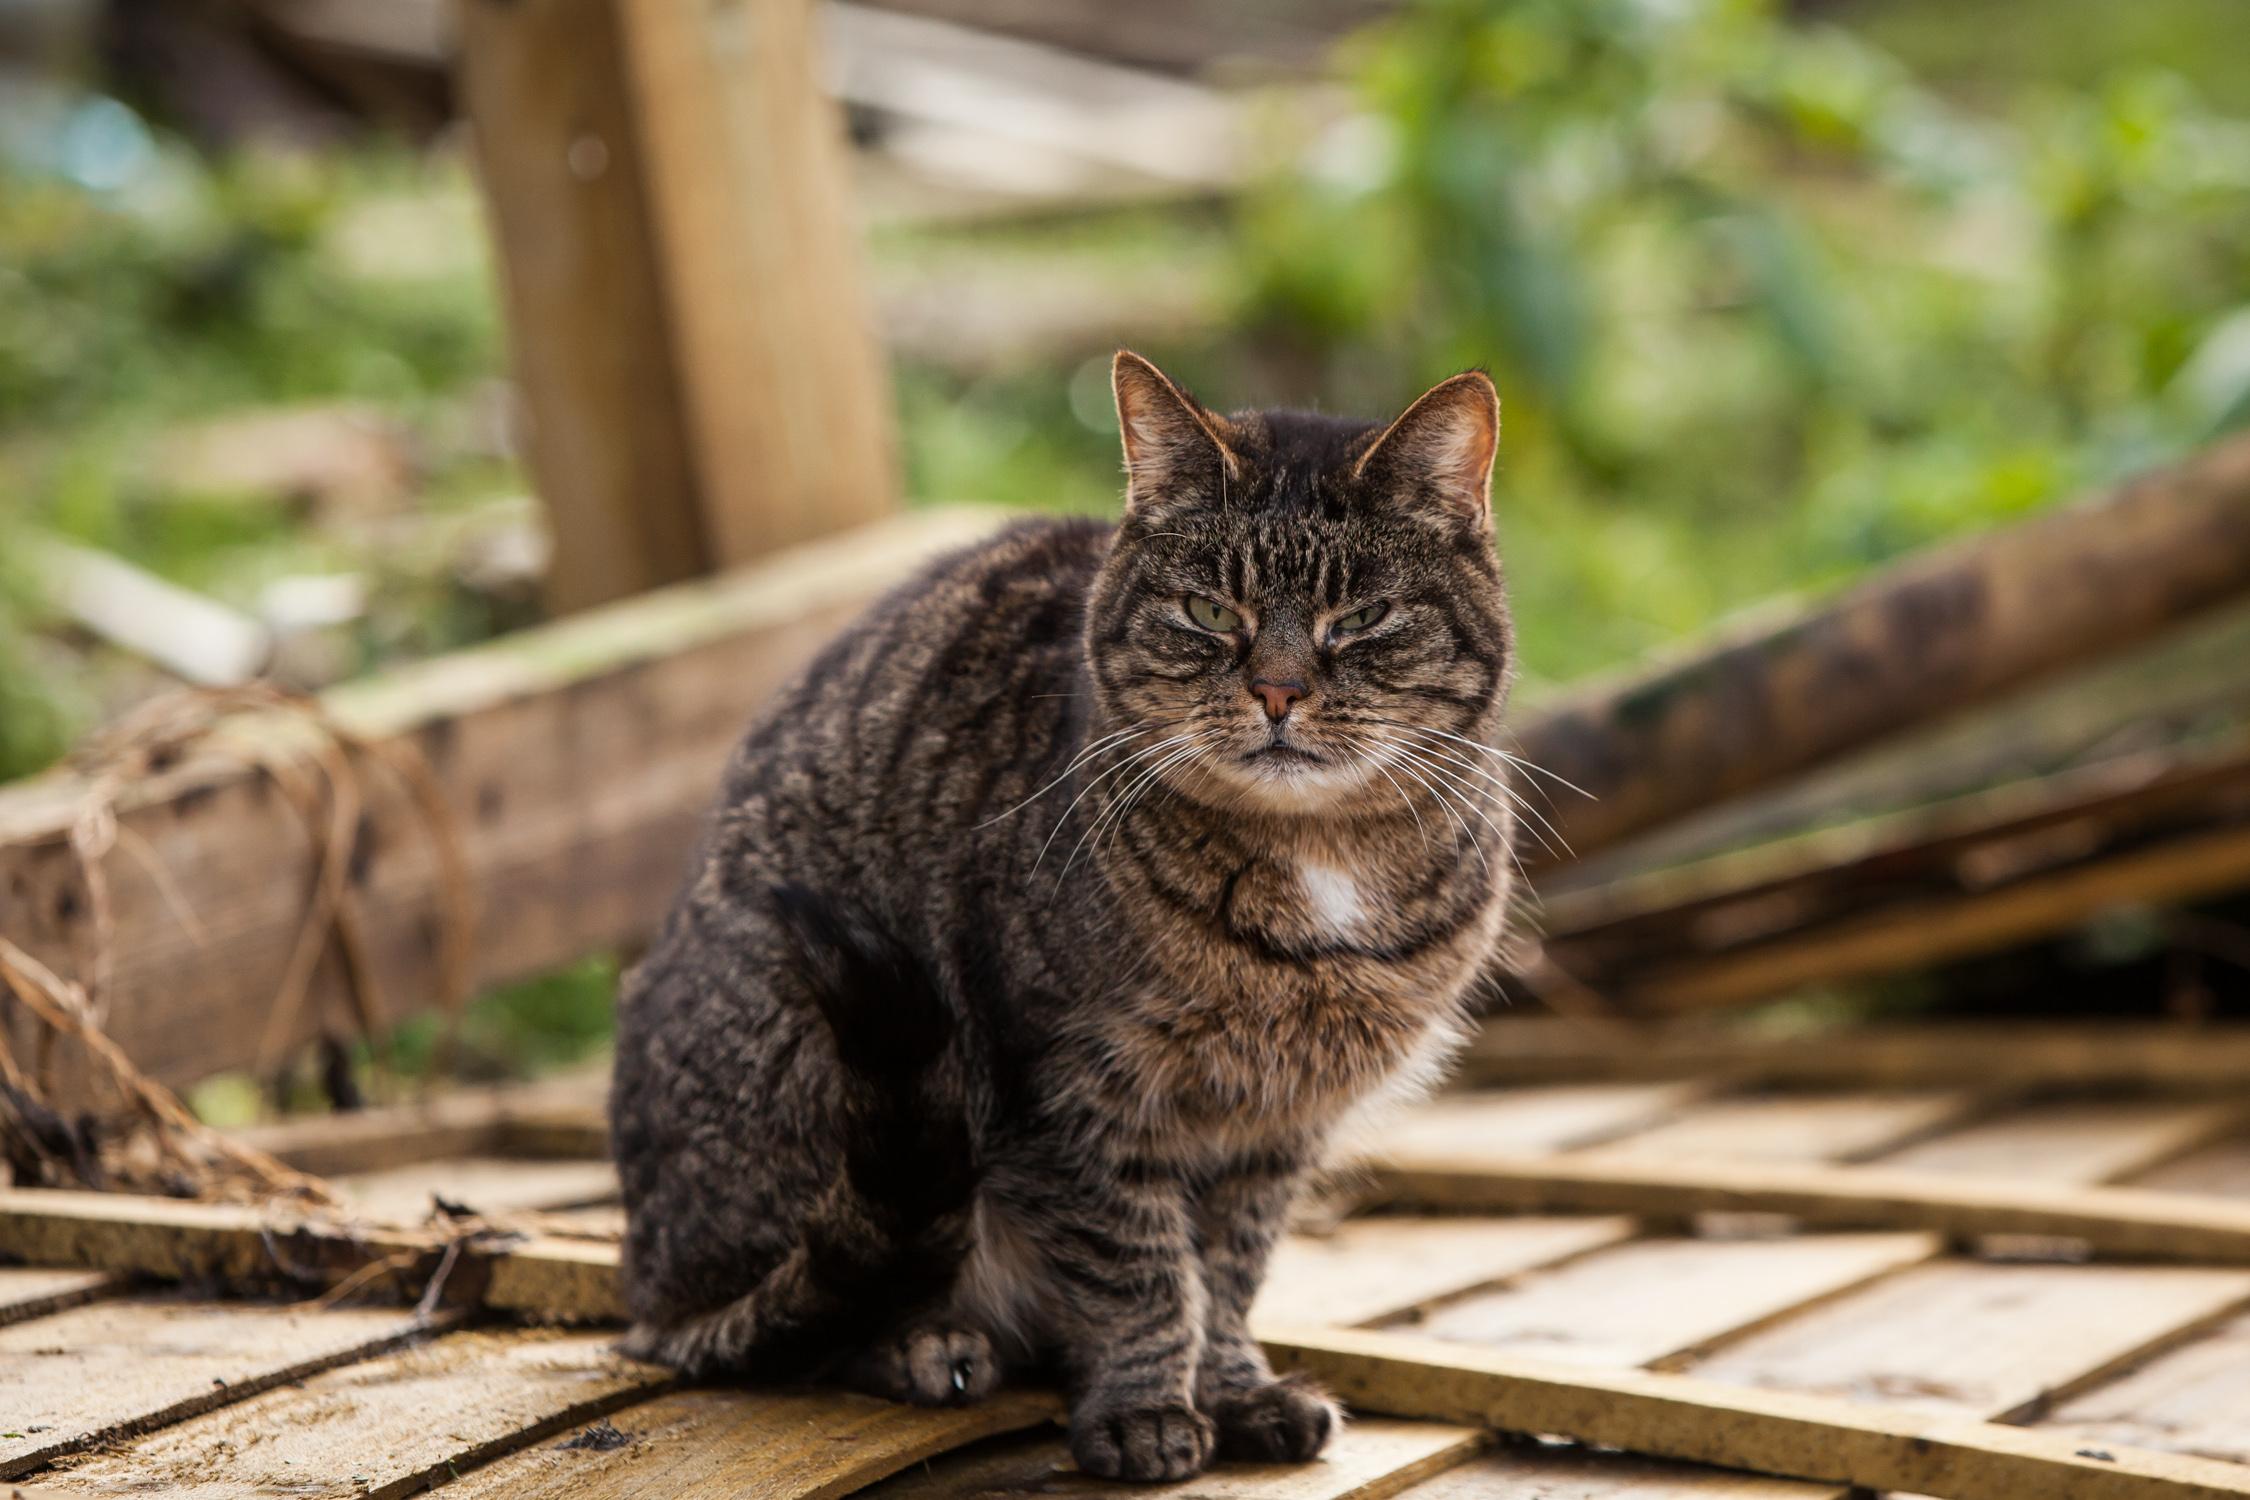 KW_Cats1_045.jpg